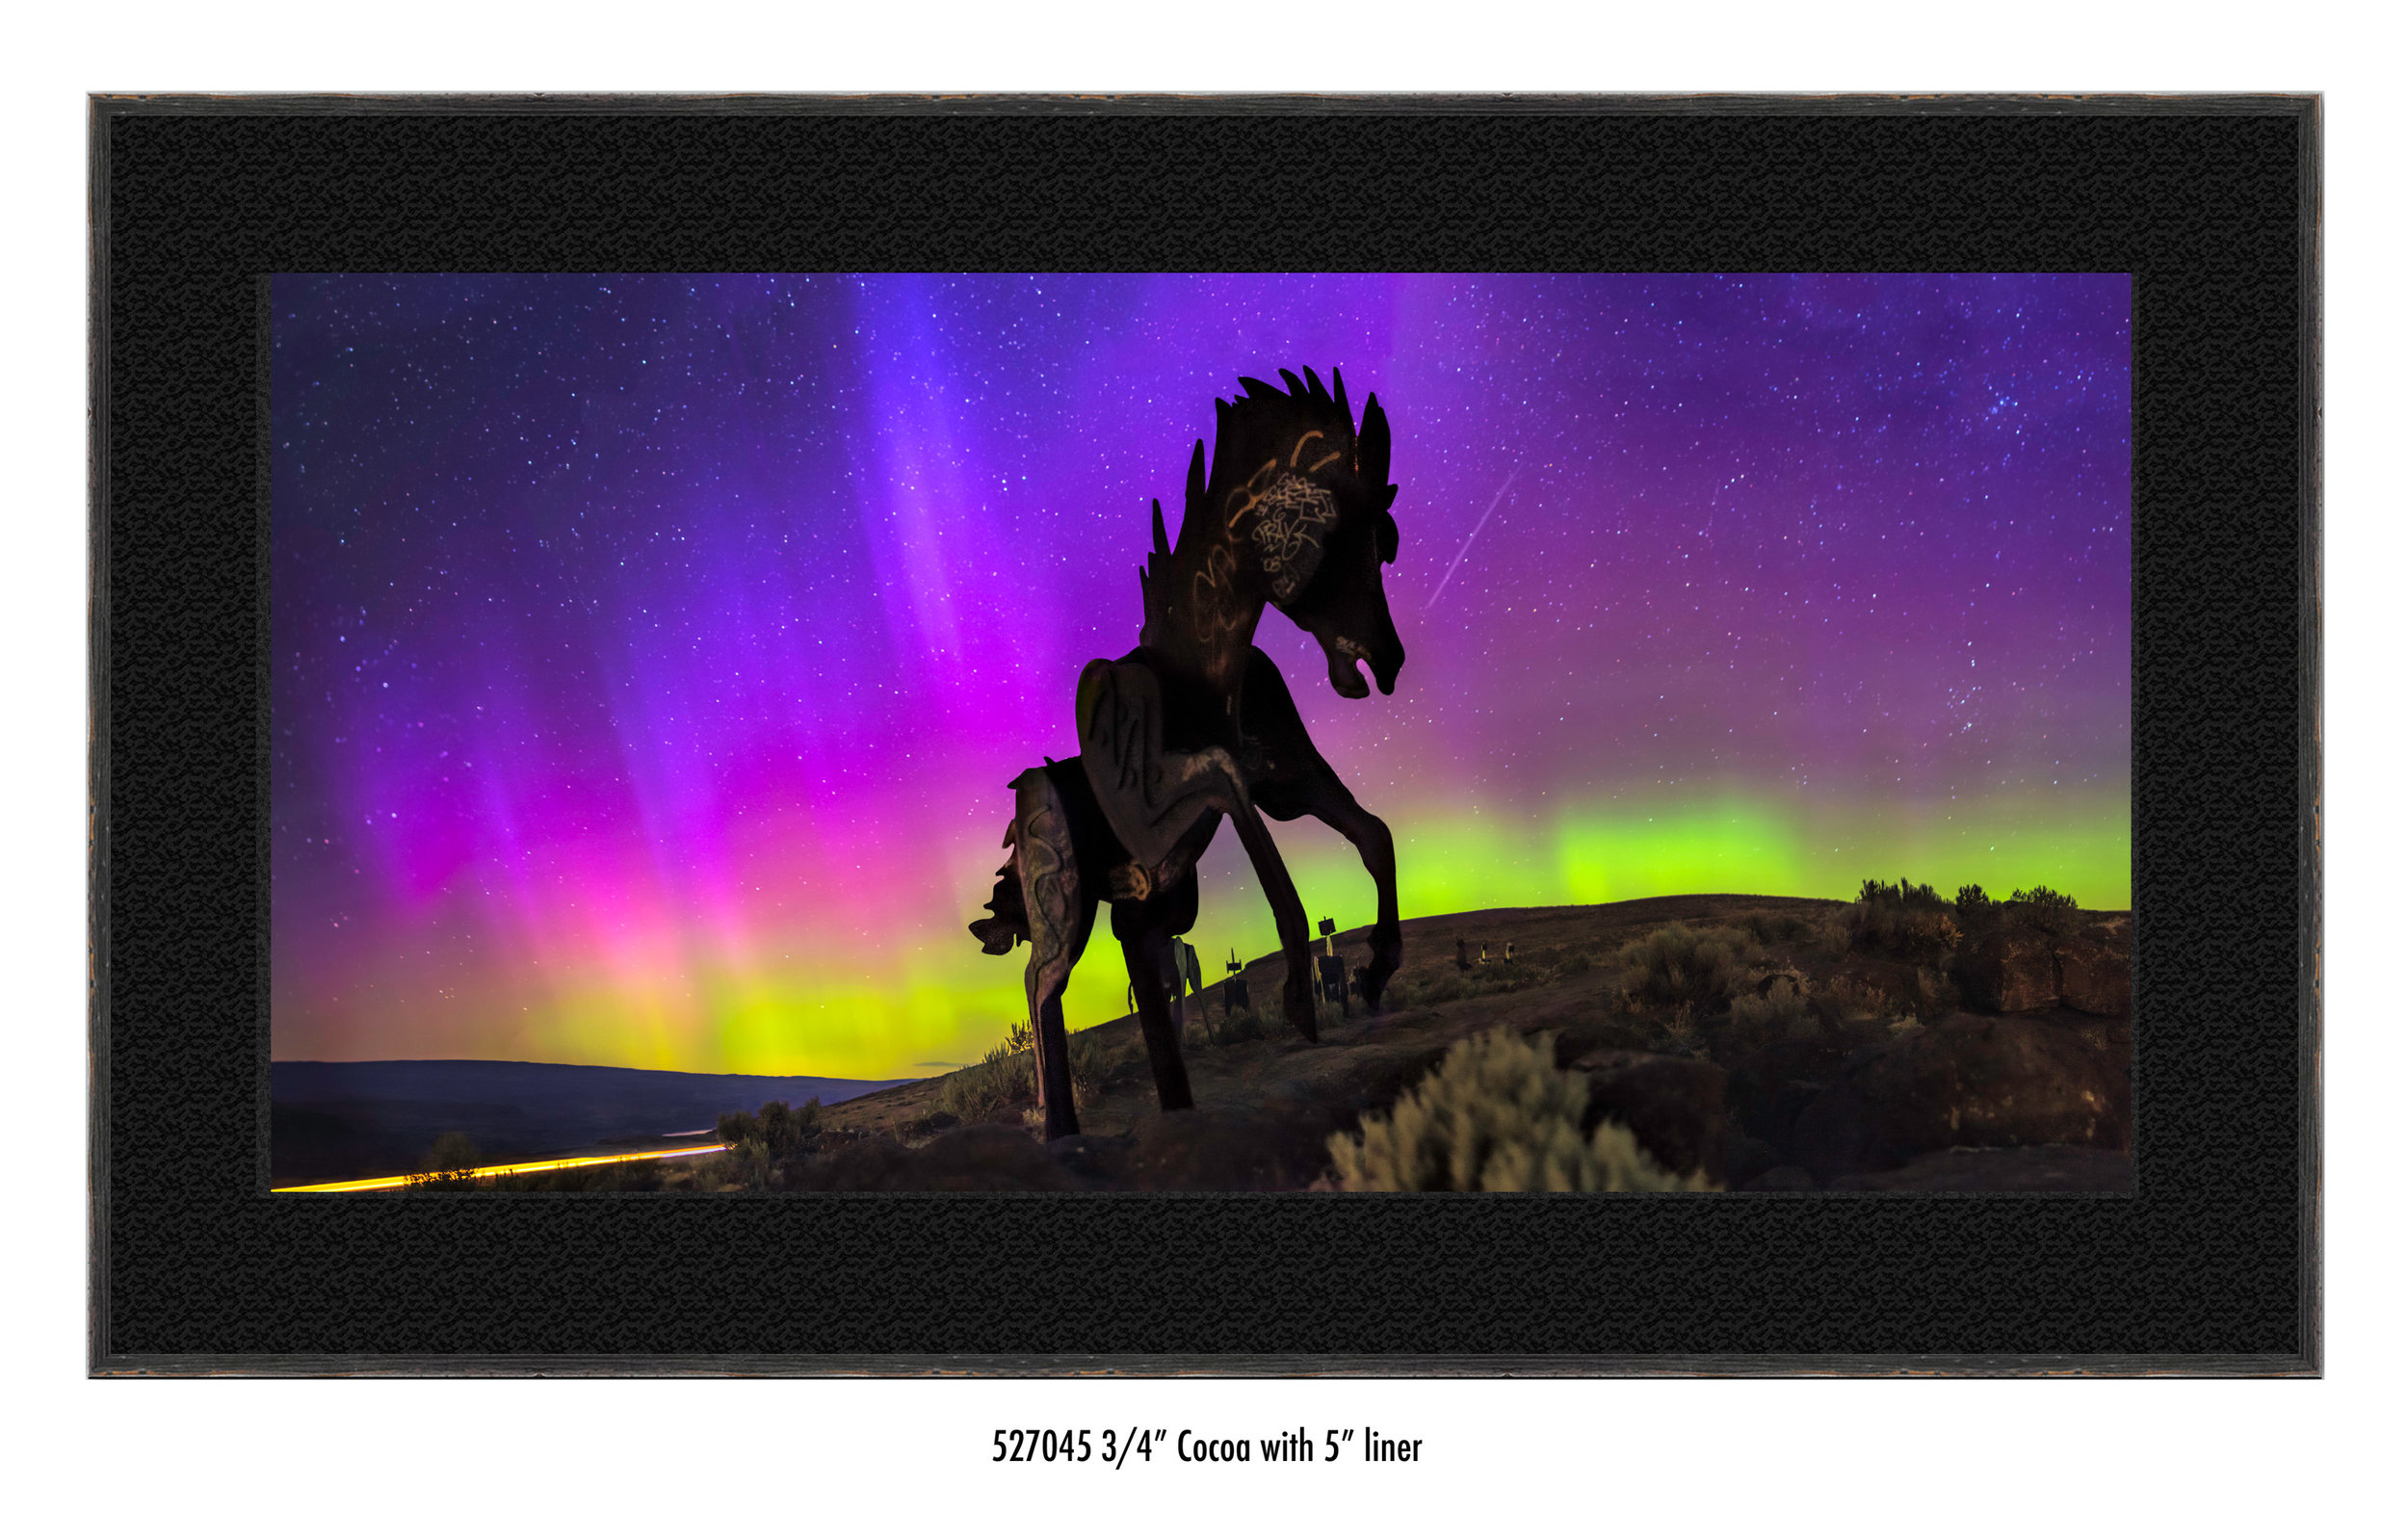 Wild-Horses-527045-blk.jpg